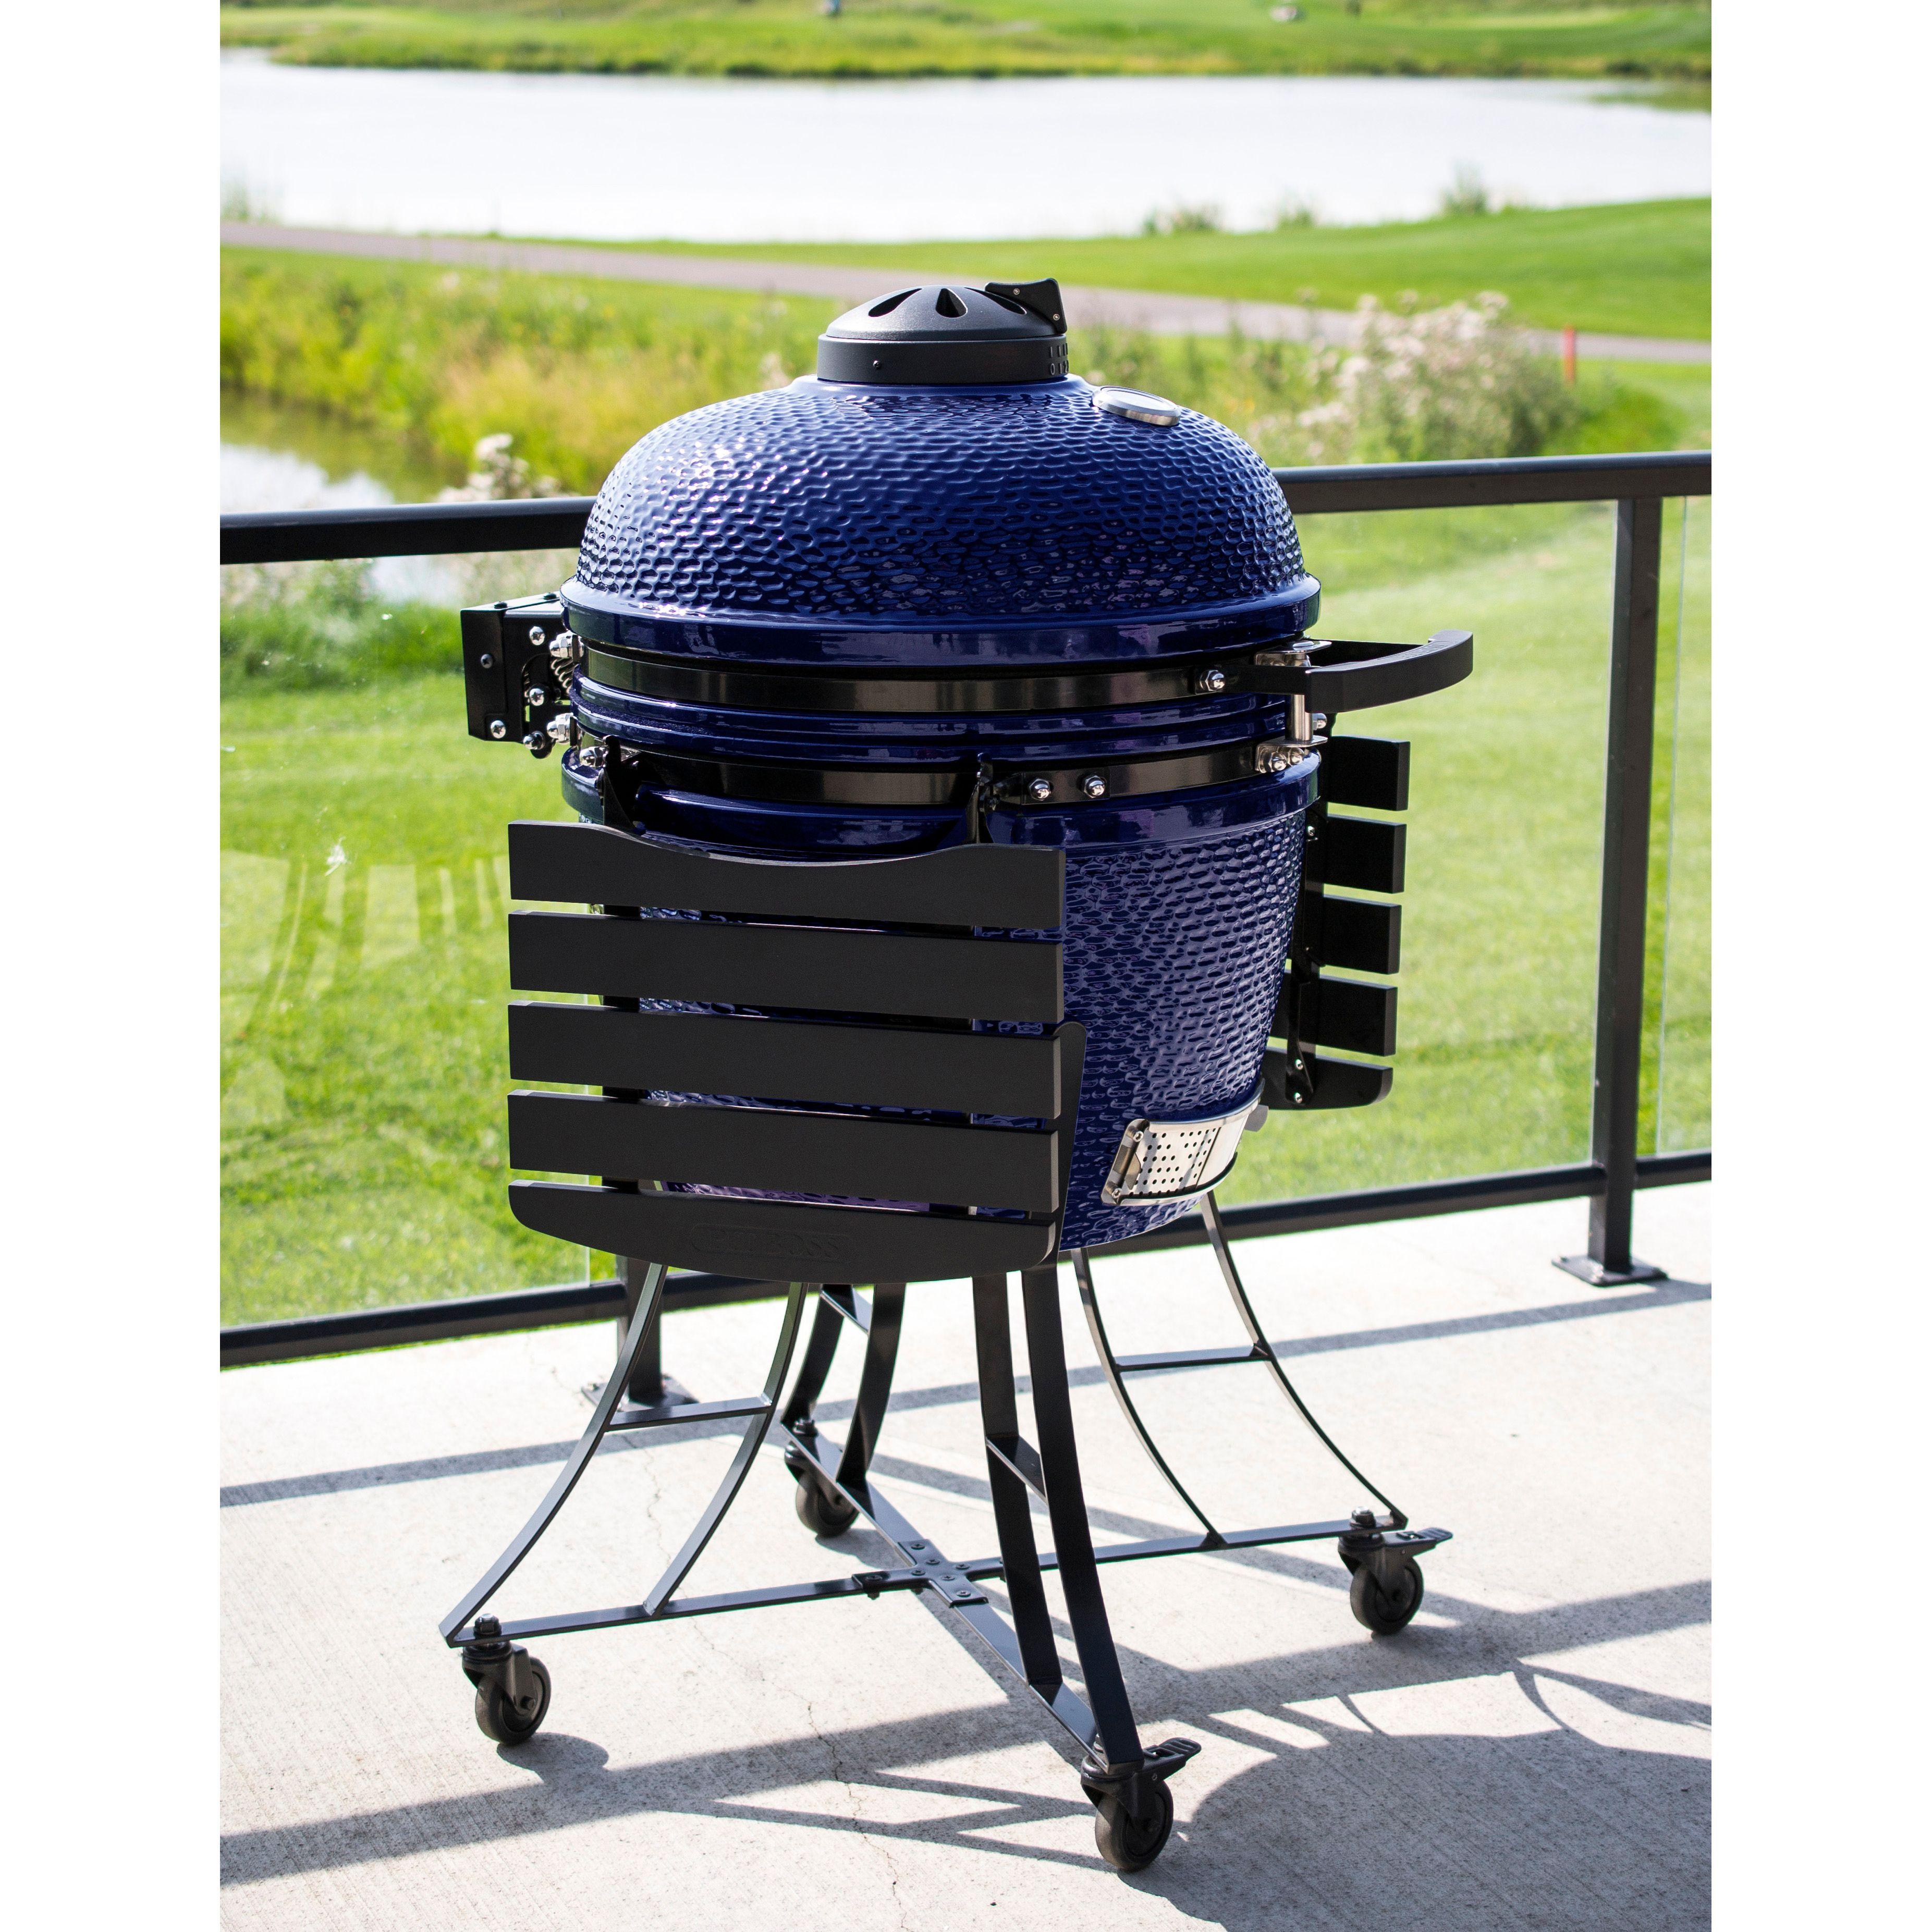 Louisiana Grills K24 Ceramic Kamado Charcoal Grill in Black